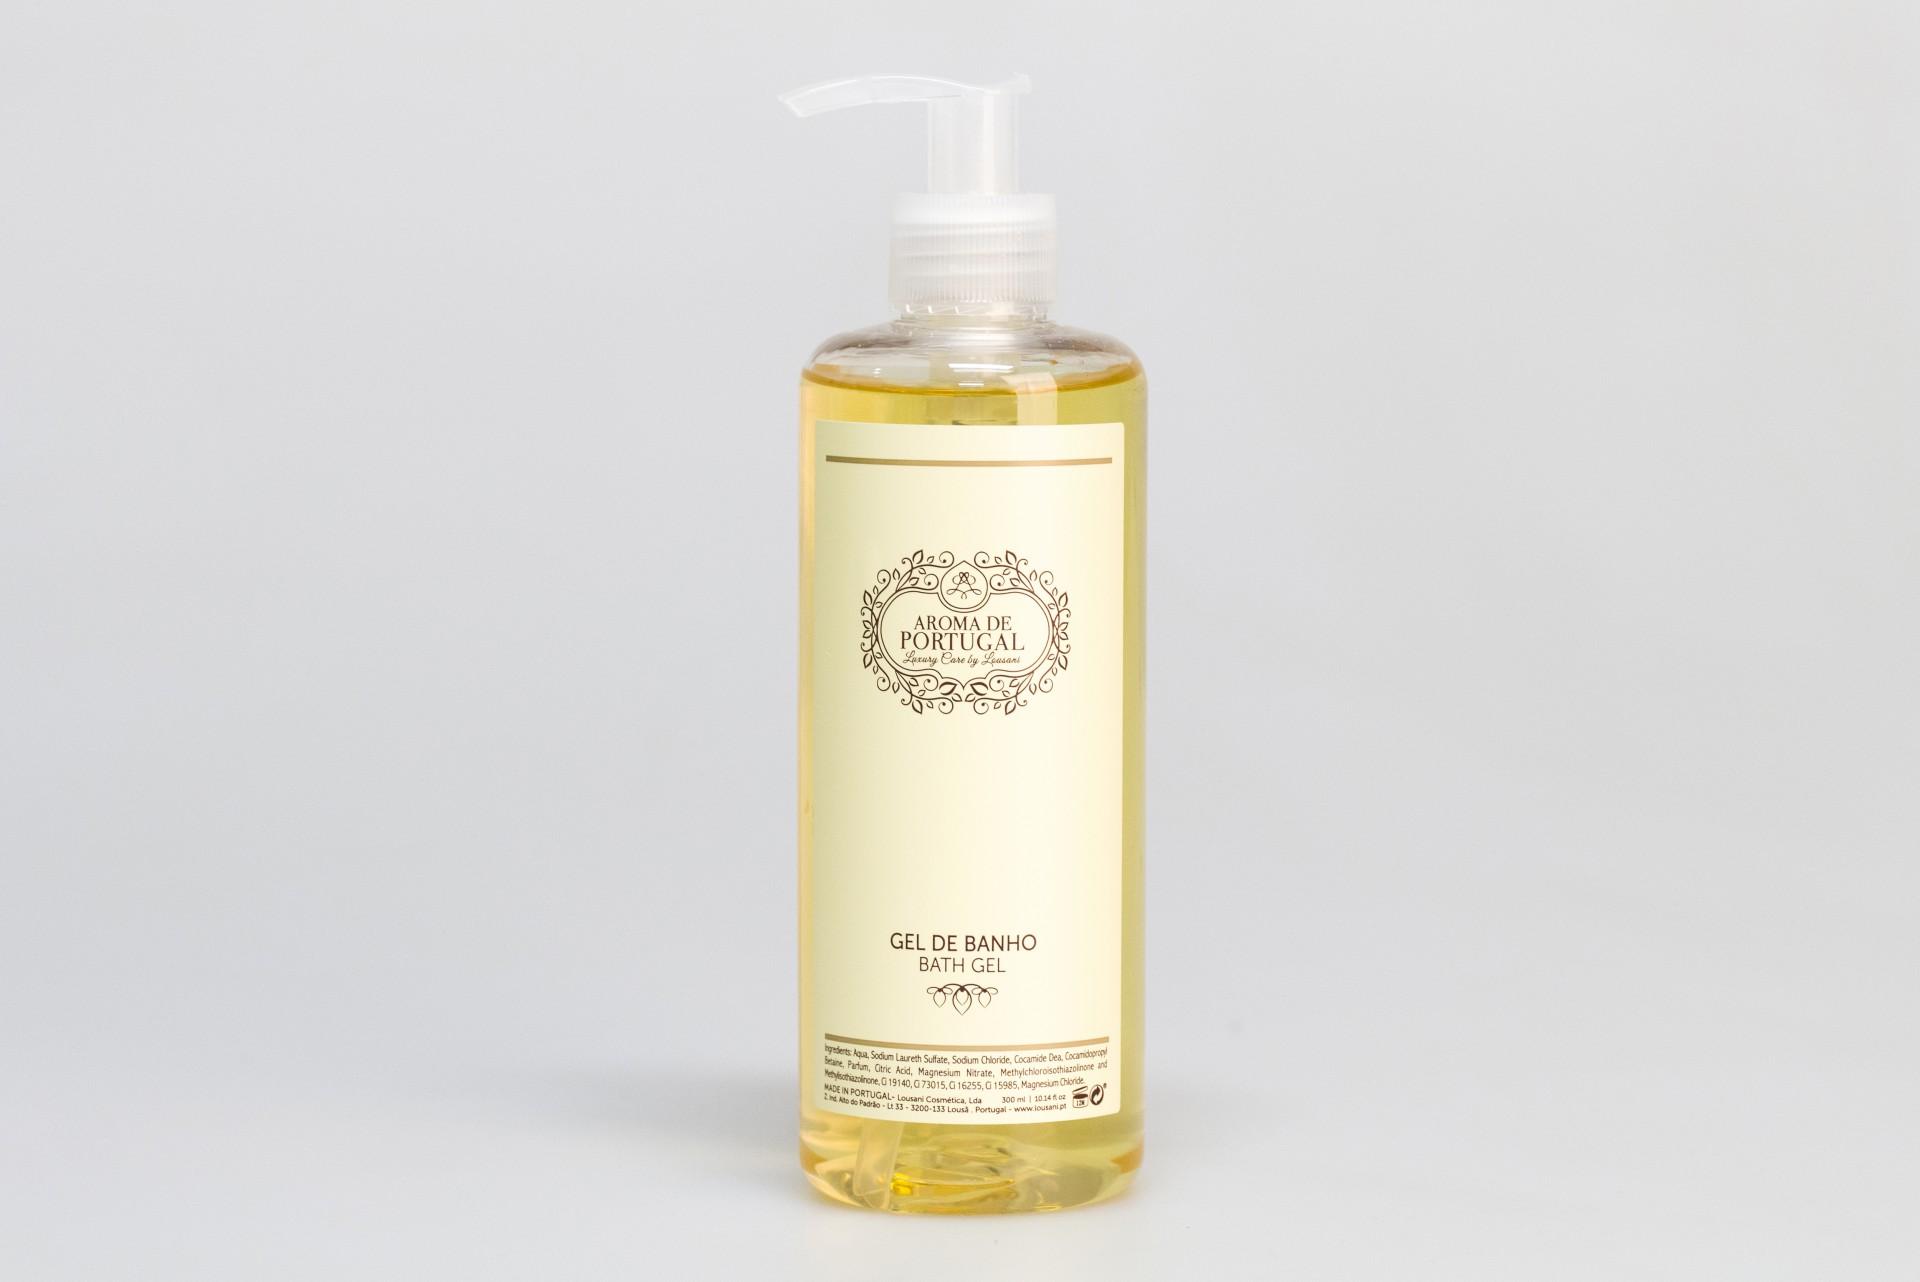 Doseador Gel banho 300 ml Aromas de Portugal